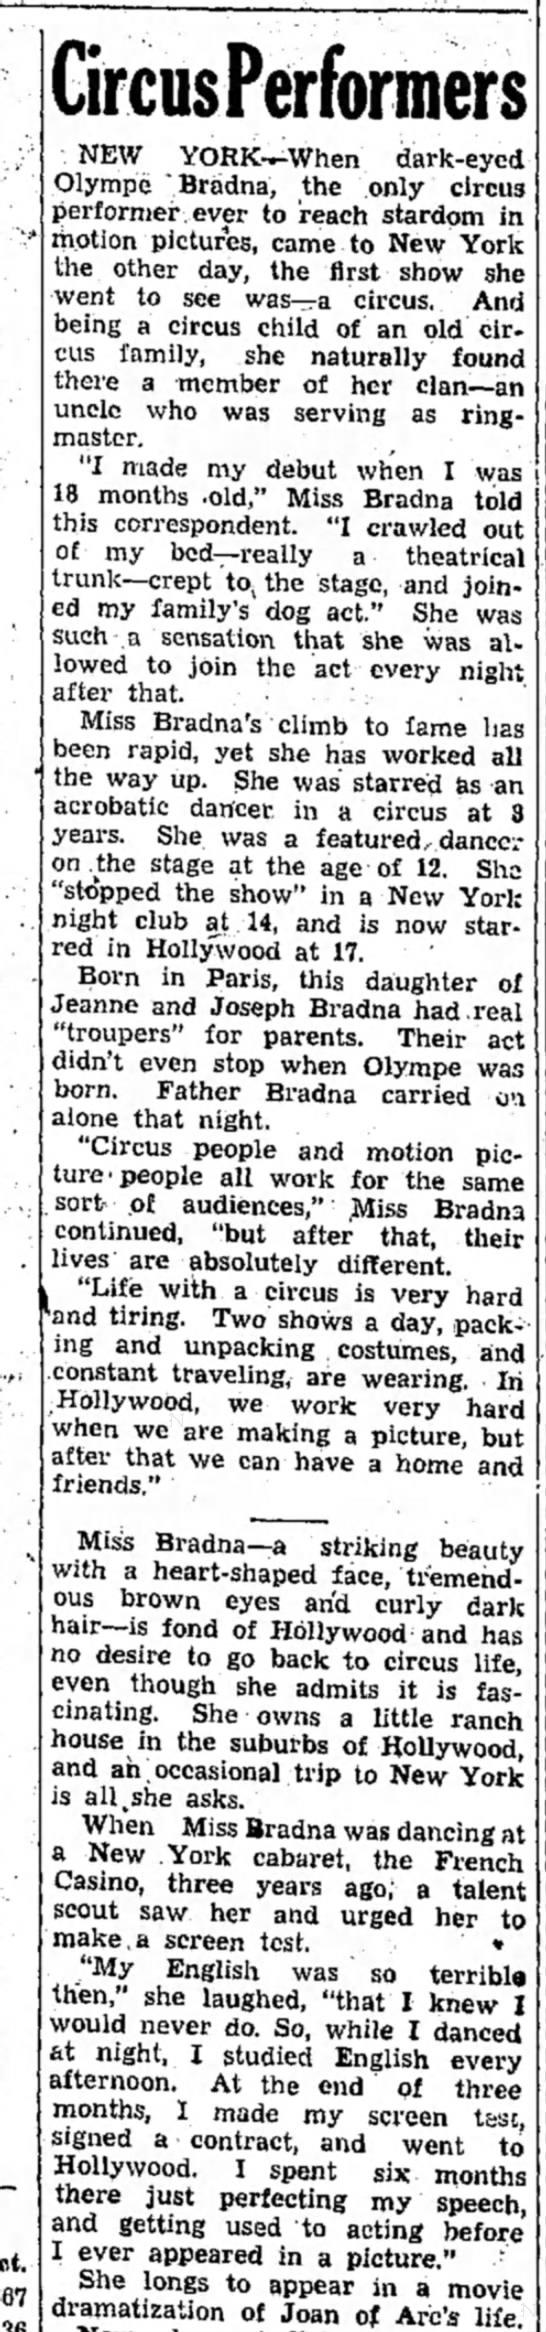 BRADNAI May 1938